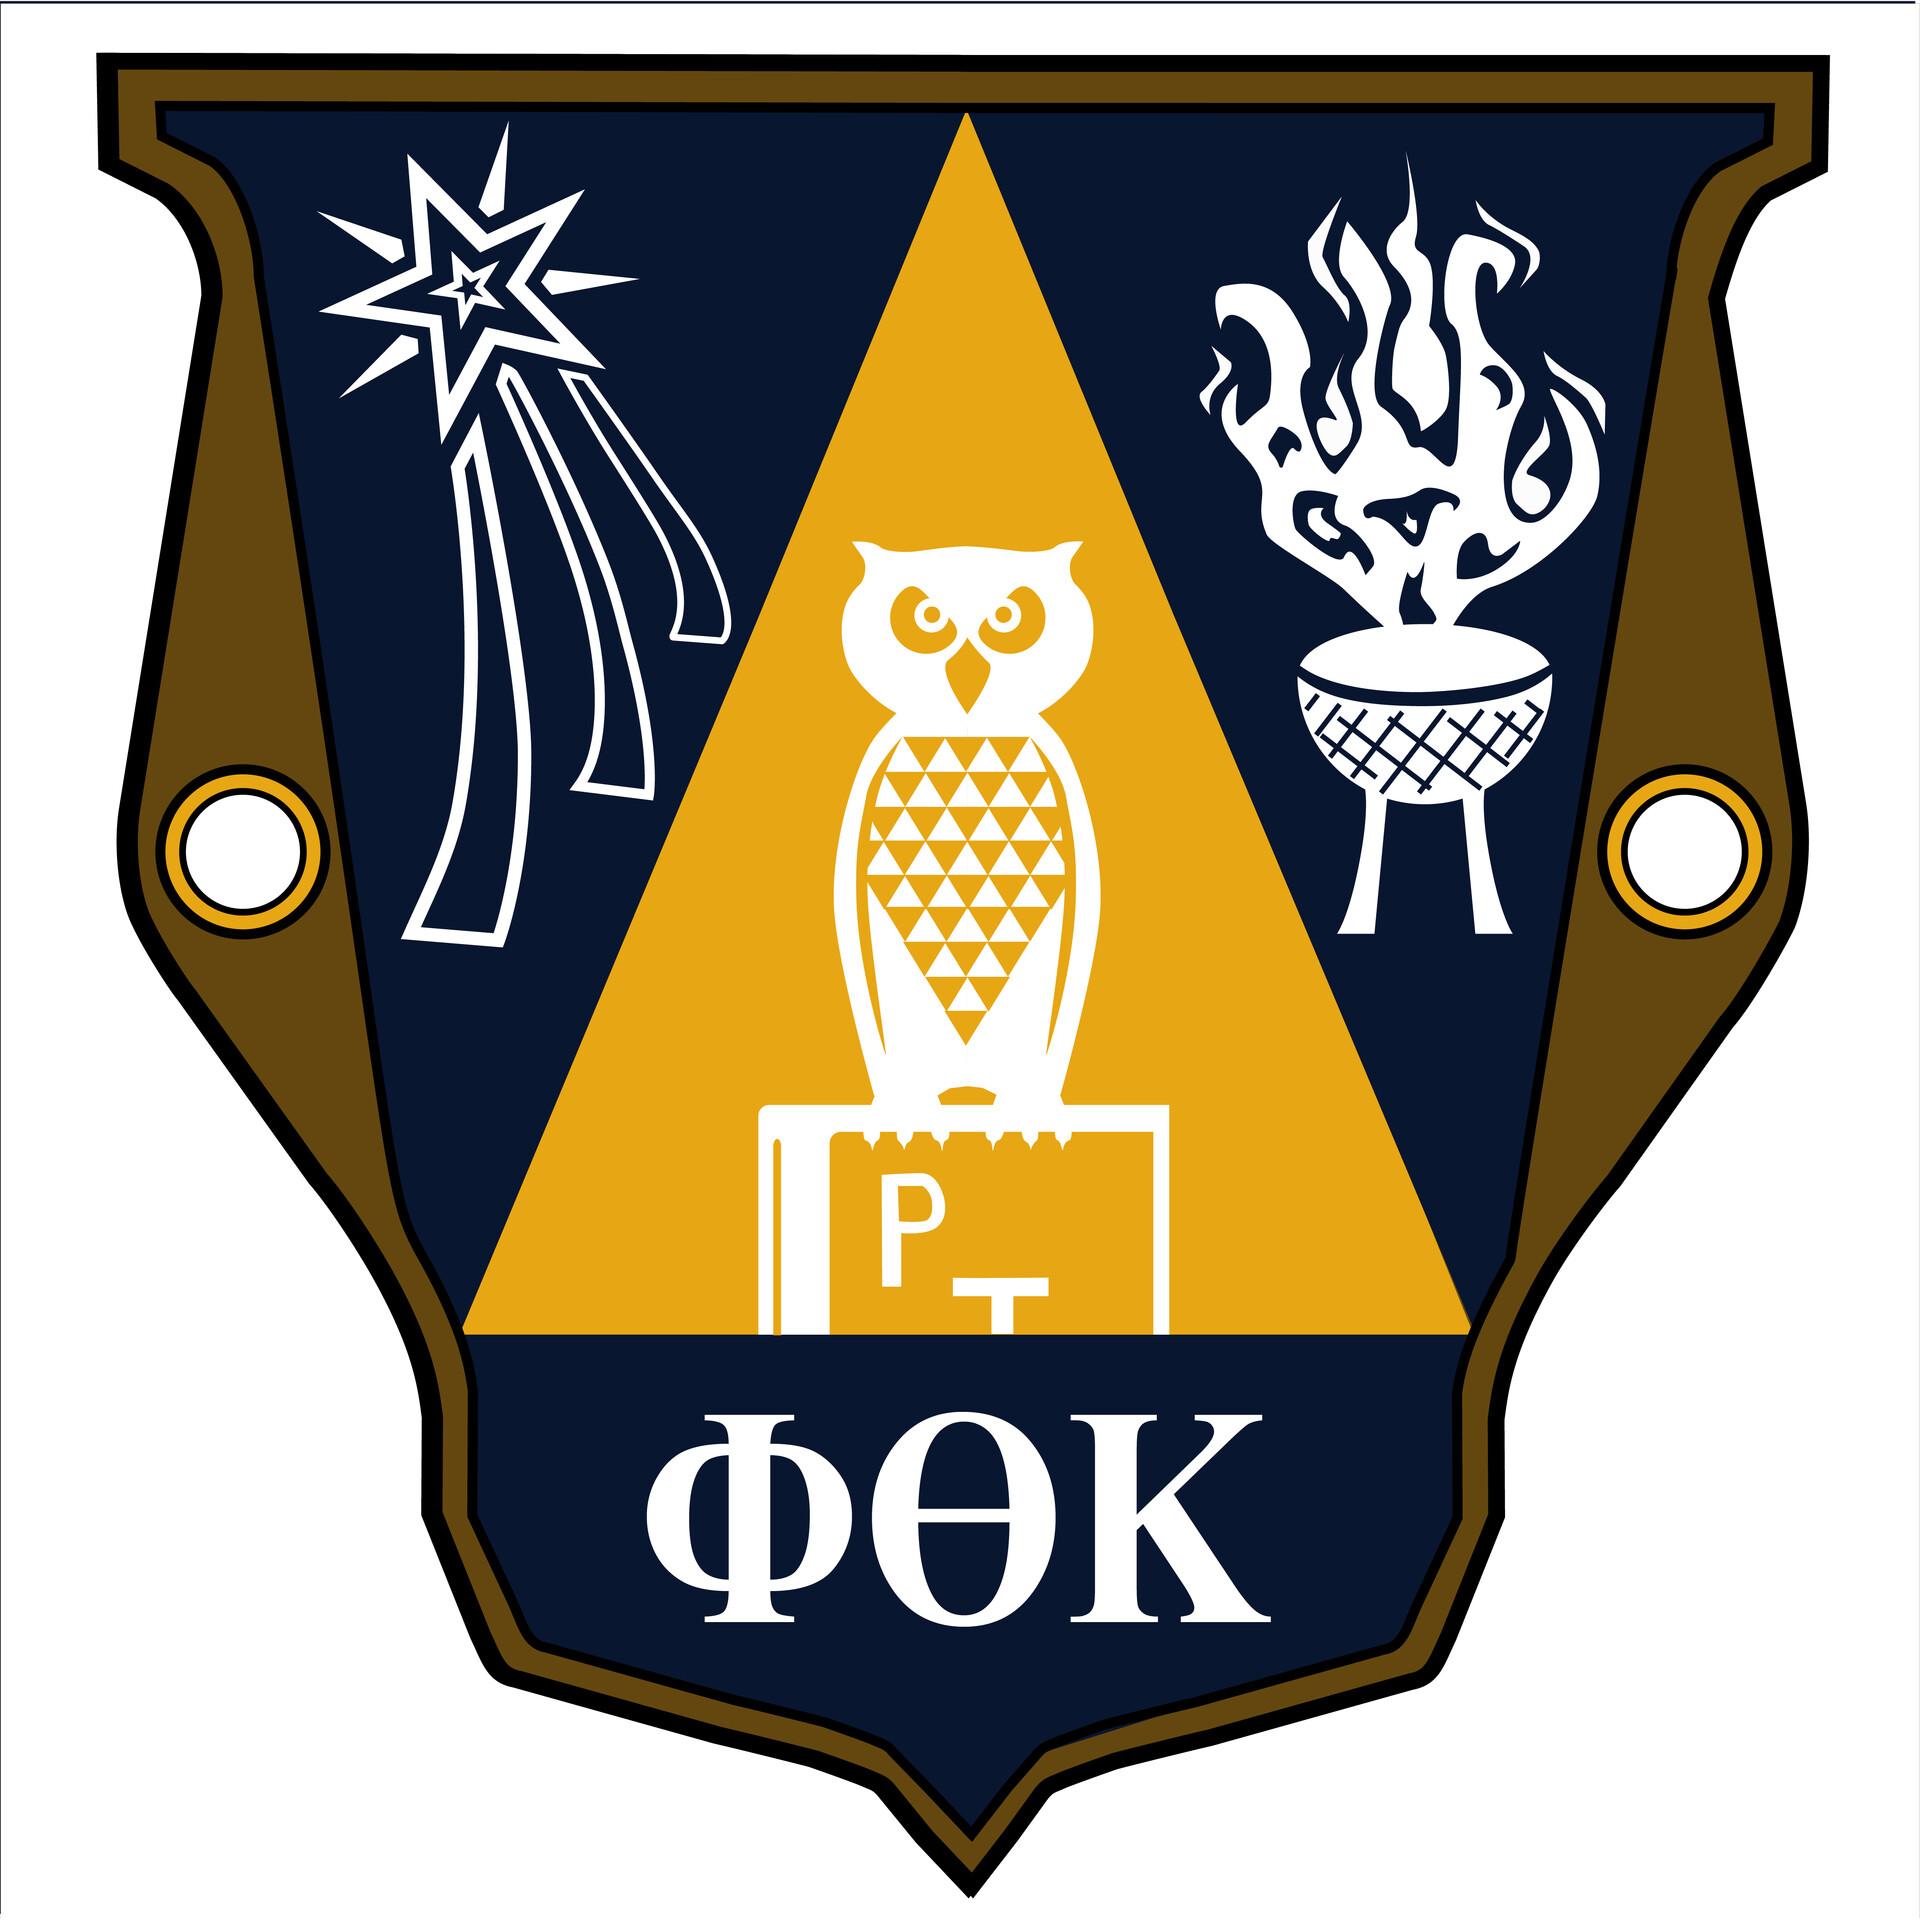 Original version of the updated crest